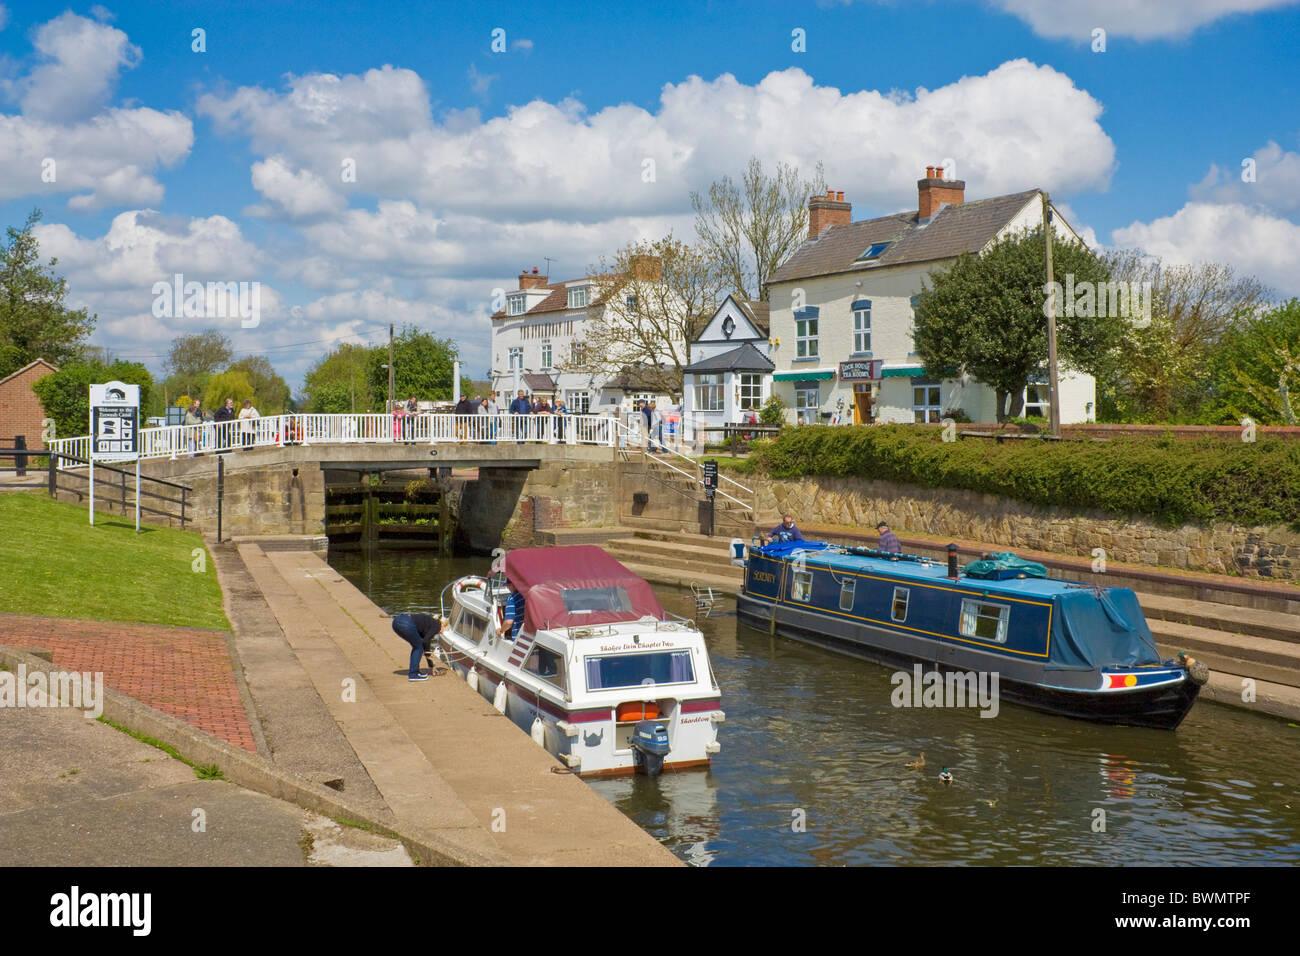 Narrow boat and motor boat at Trent Lock, Sawley near Long Eaton, Derbyshire, England, GB, UK, EU, Europe - Stock Image